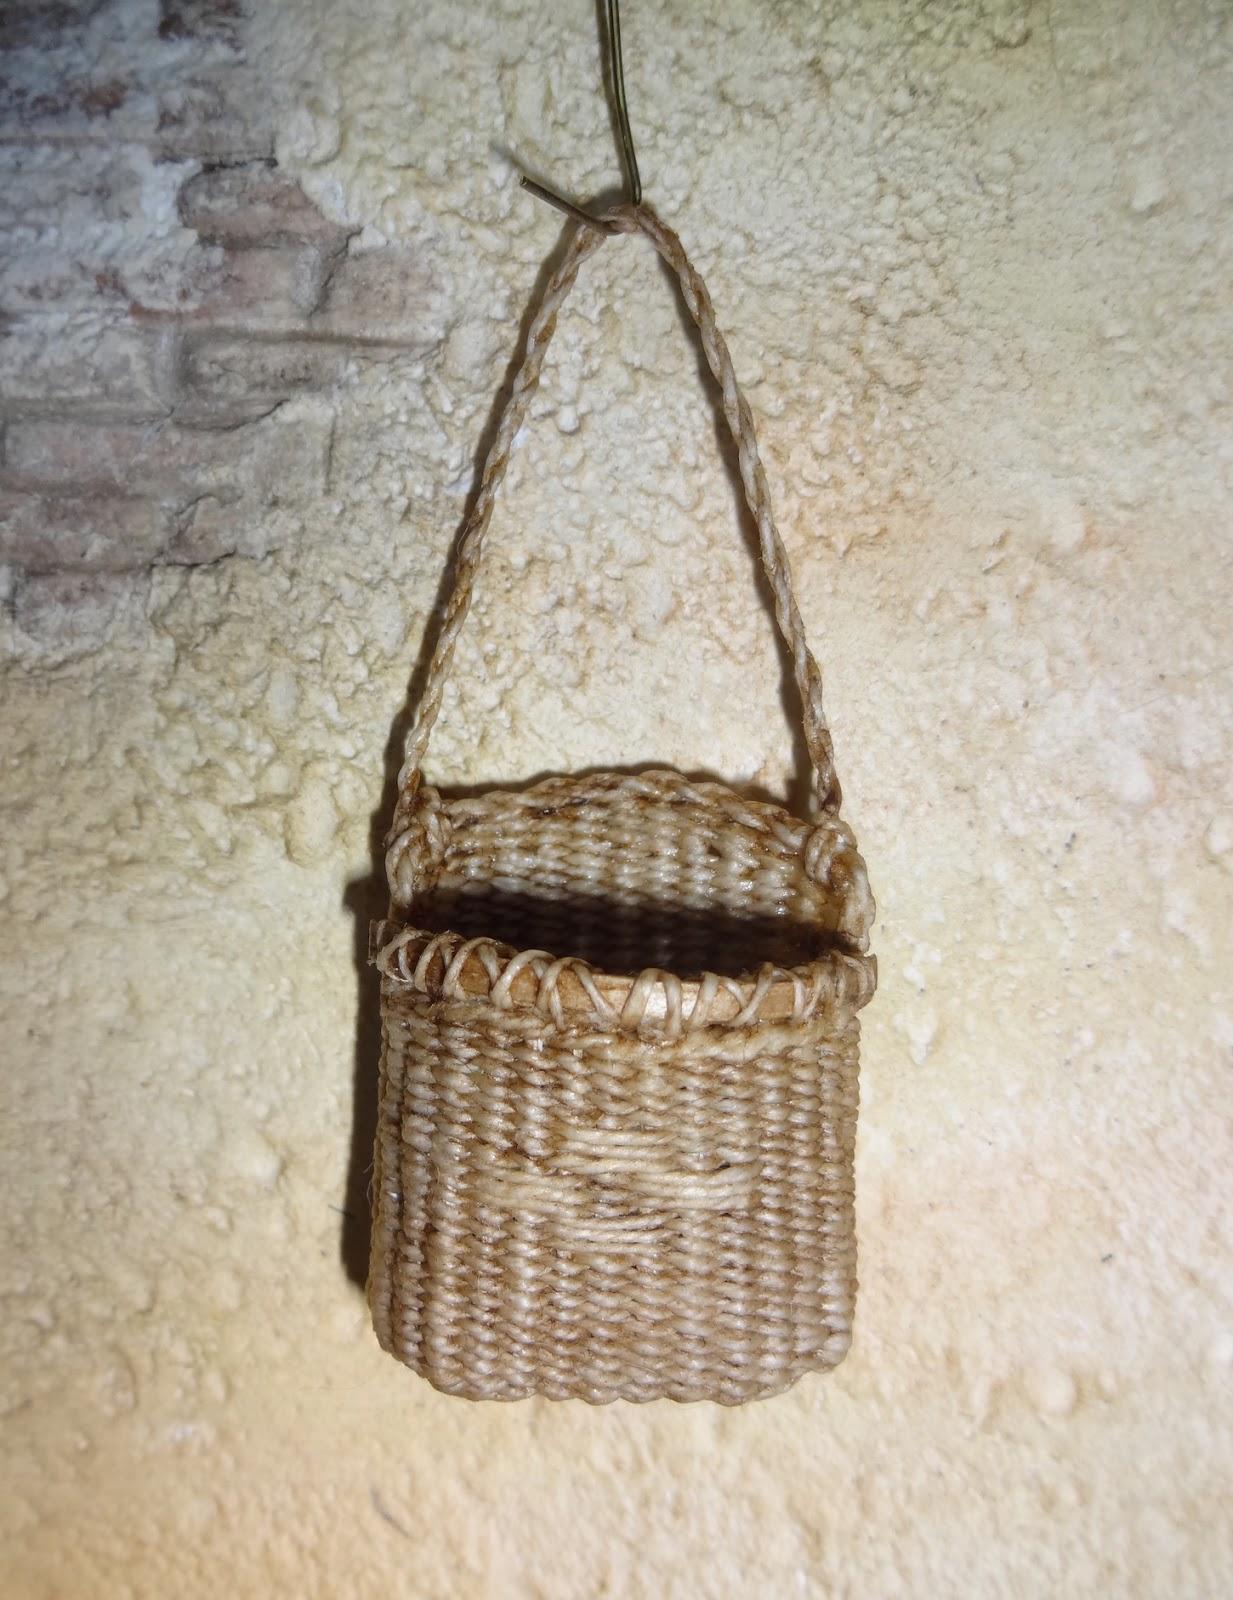 Wall Hanging Baskets basketcase miniatures: some wall hanging baskets